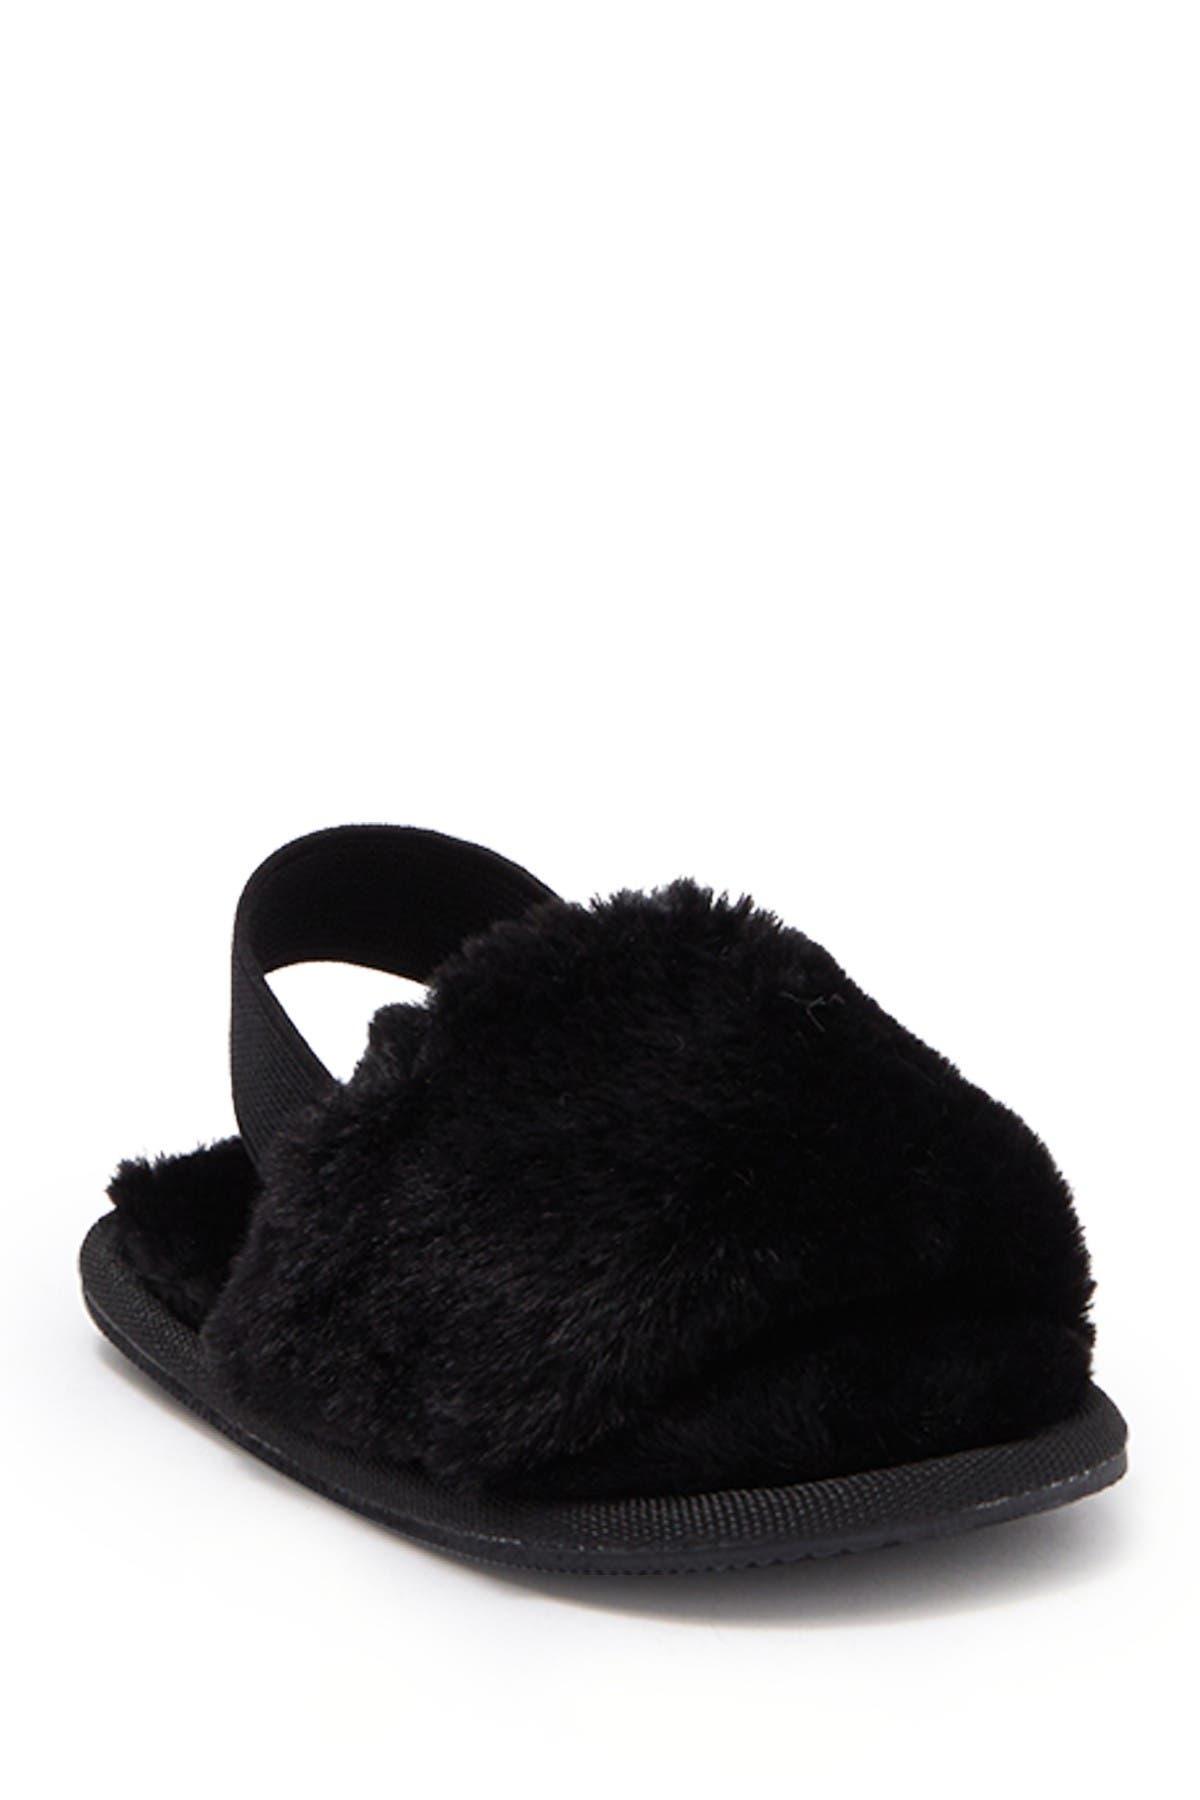 Image of Top Moda Mel Faux Fur Slipper